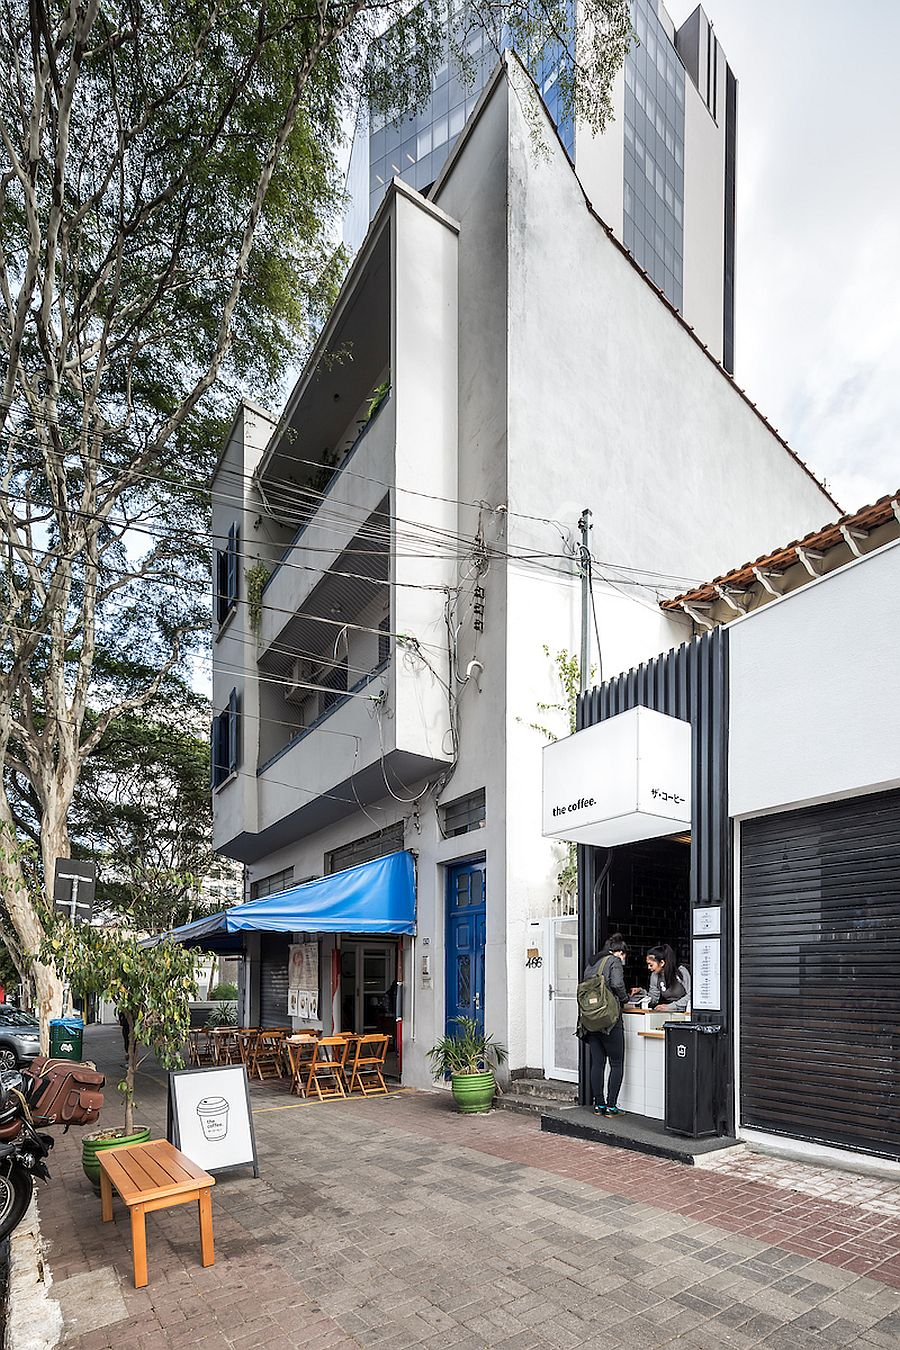 Japanese minimalism coupled with modern ergonomic design in Brazil